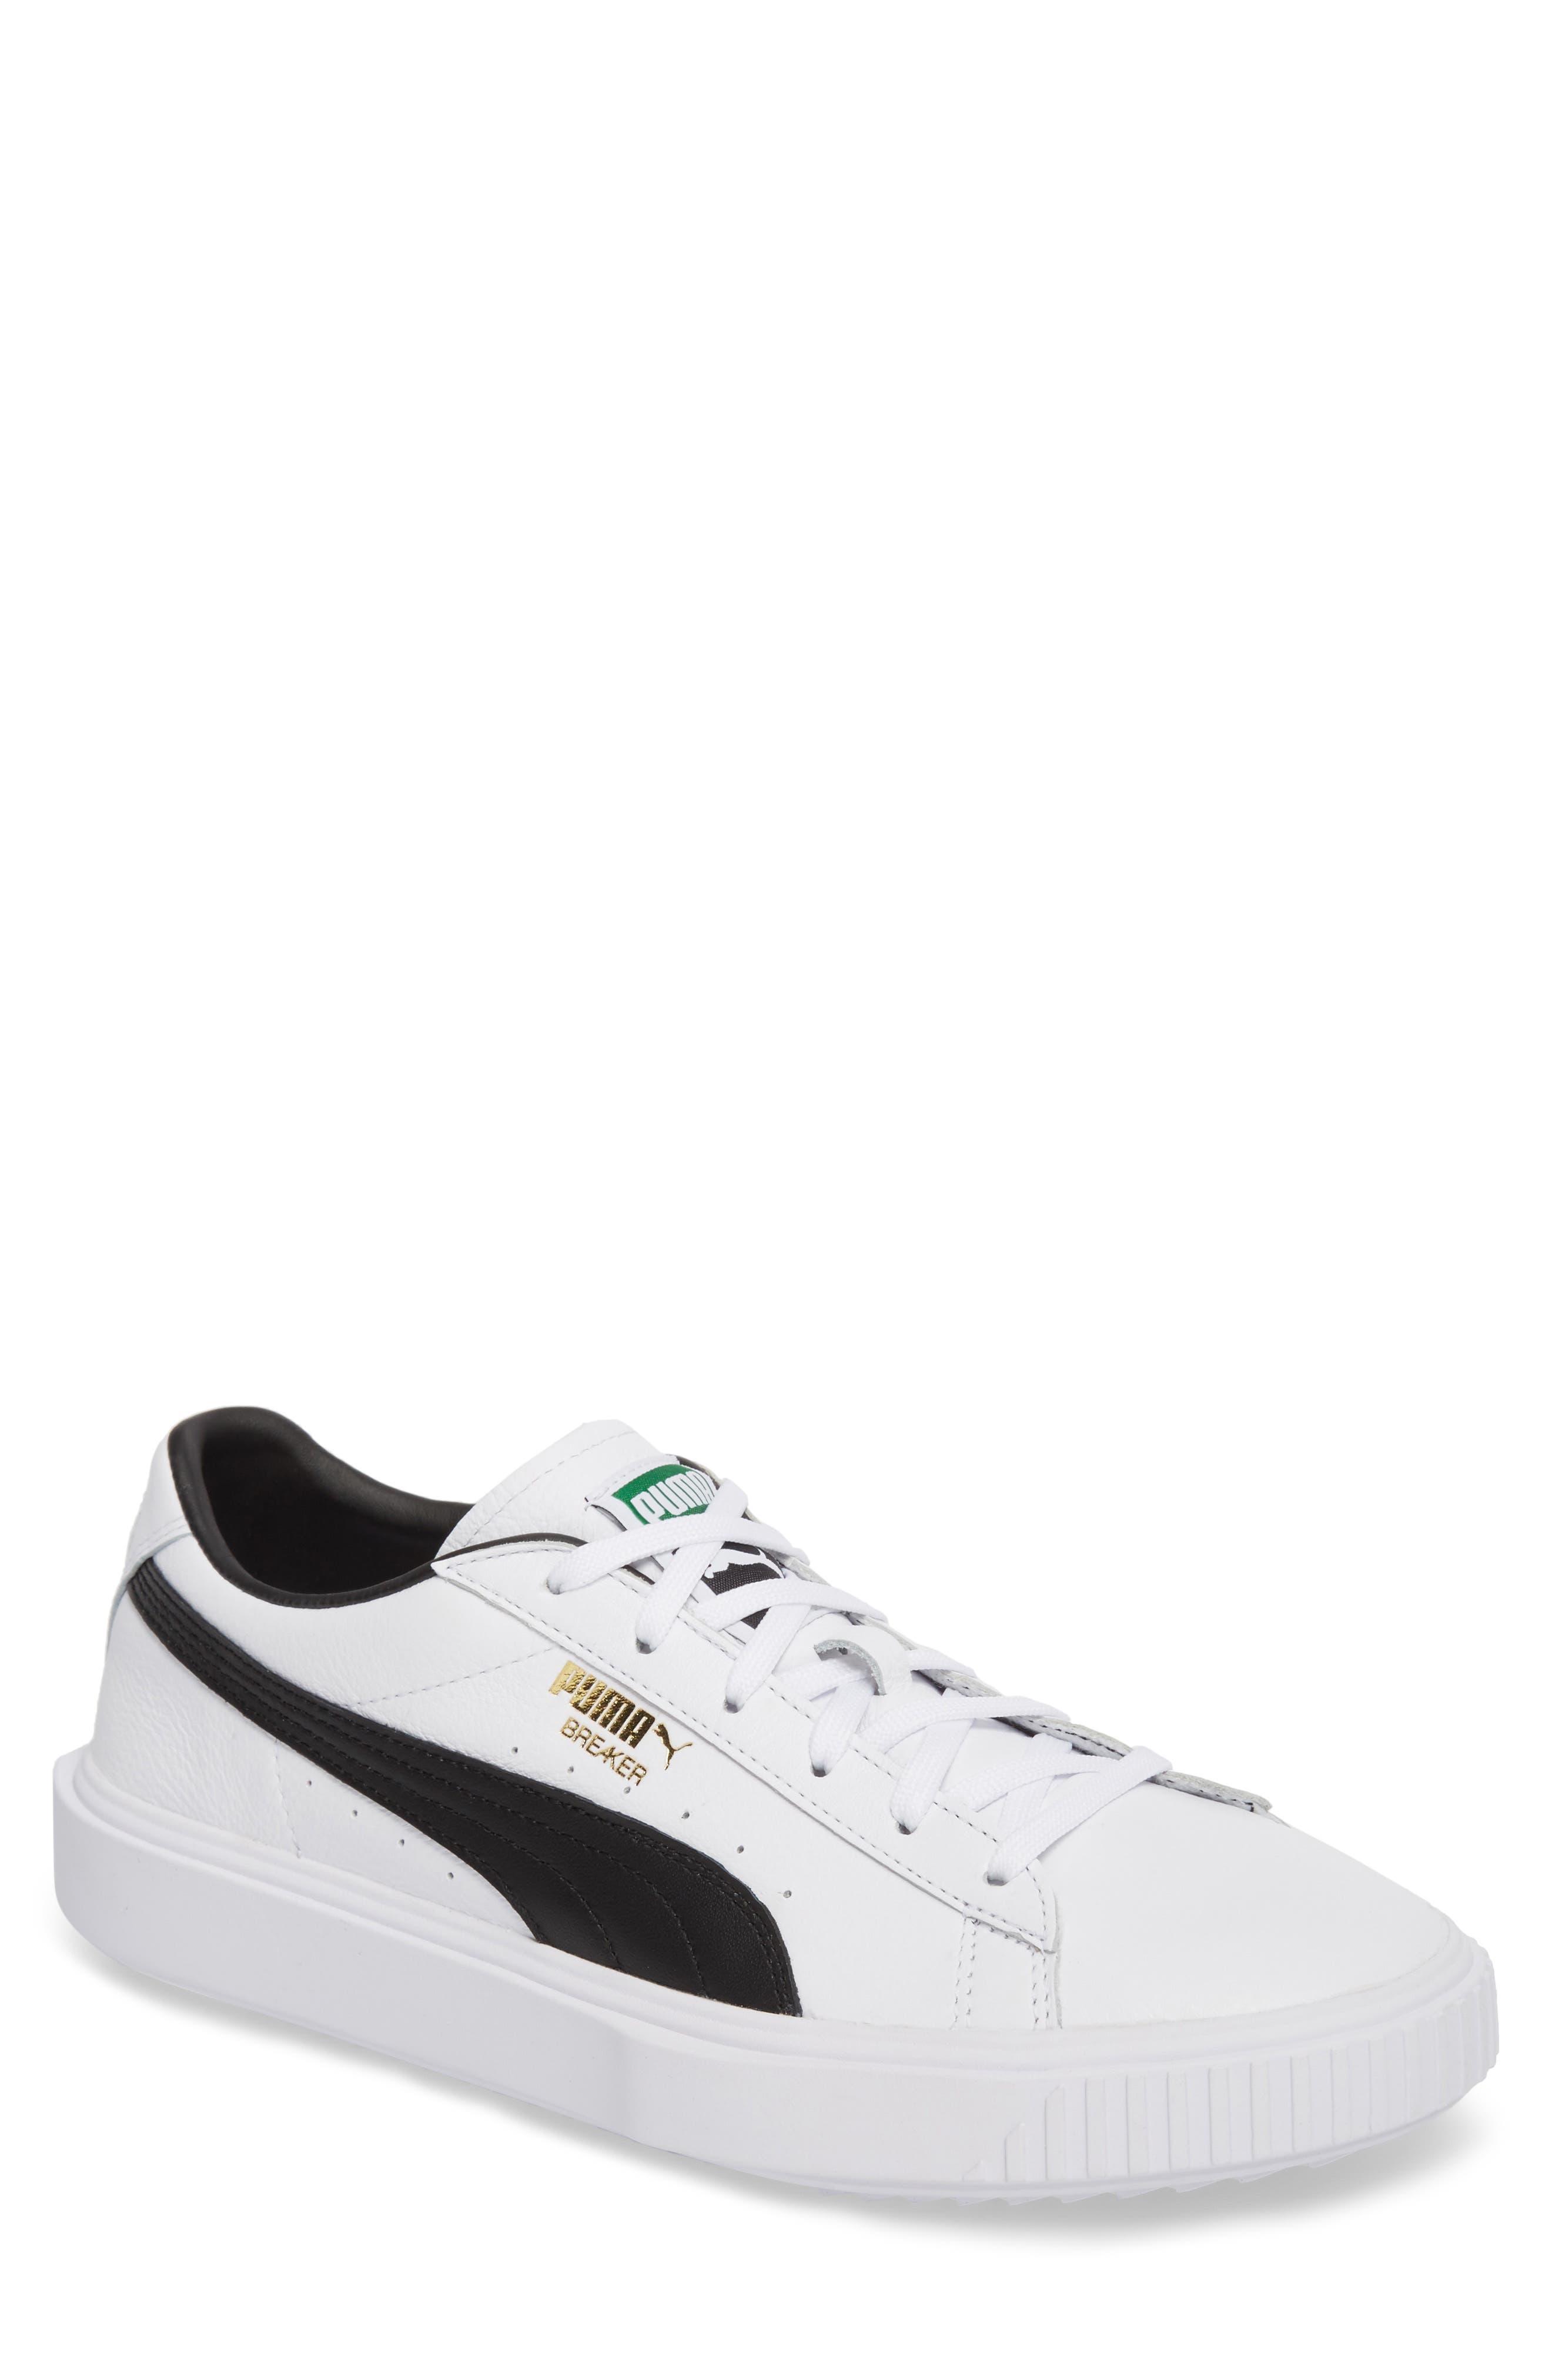 Breaker Low Top Sneaker,                         Main,                         color, WHITE/ BLACK LEATHER